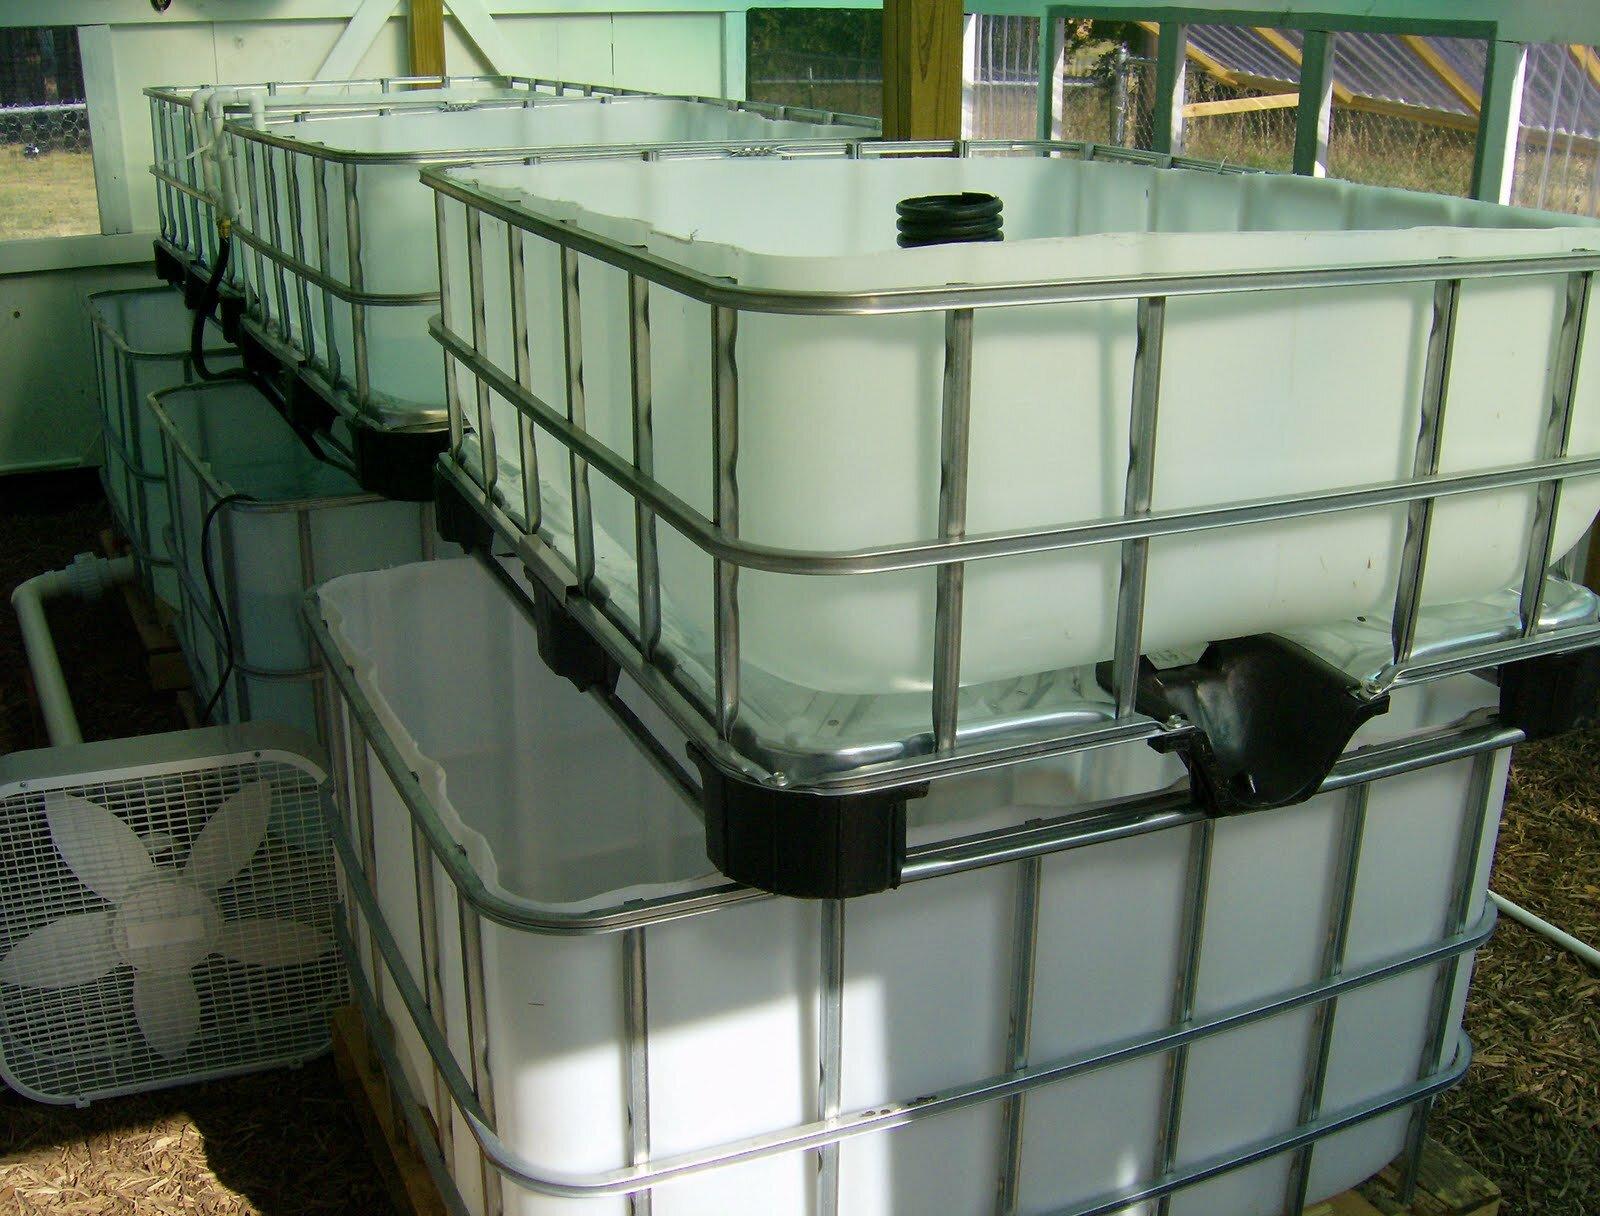 Bl system how many fish in a 55 aquaponics tank info - Ibc Tote Aquaponics